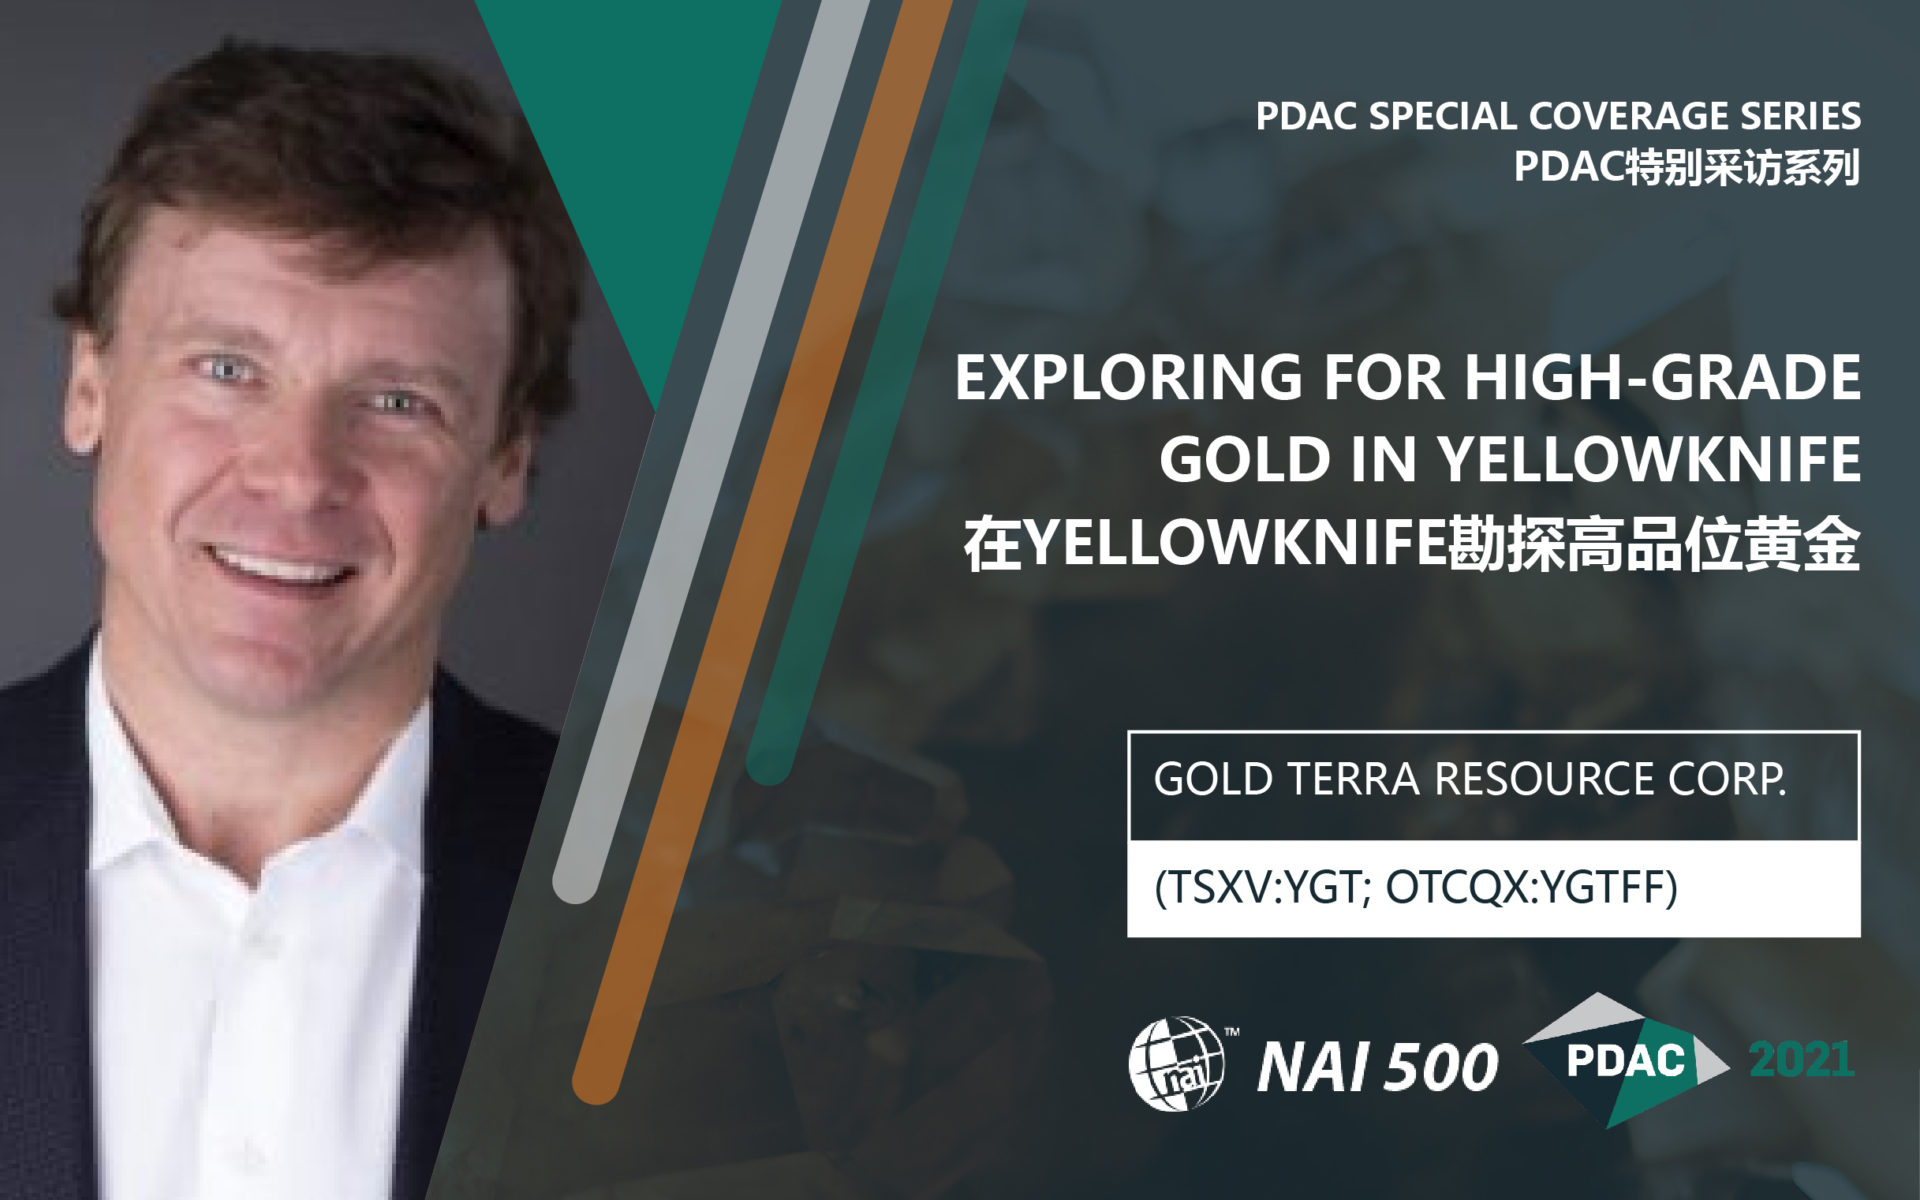 Gold Terra Resource